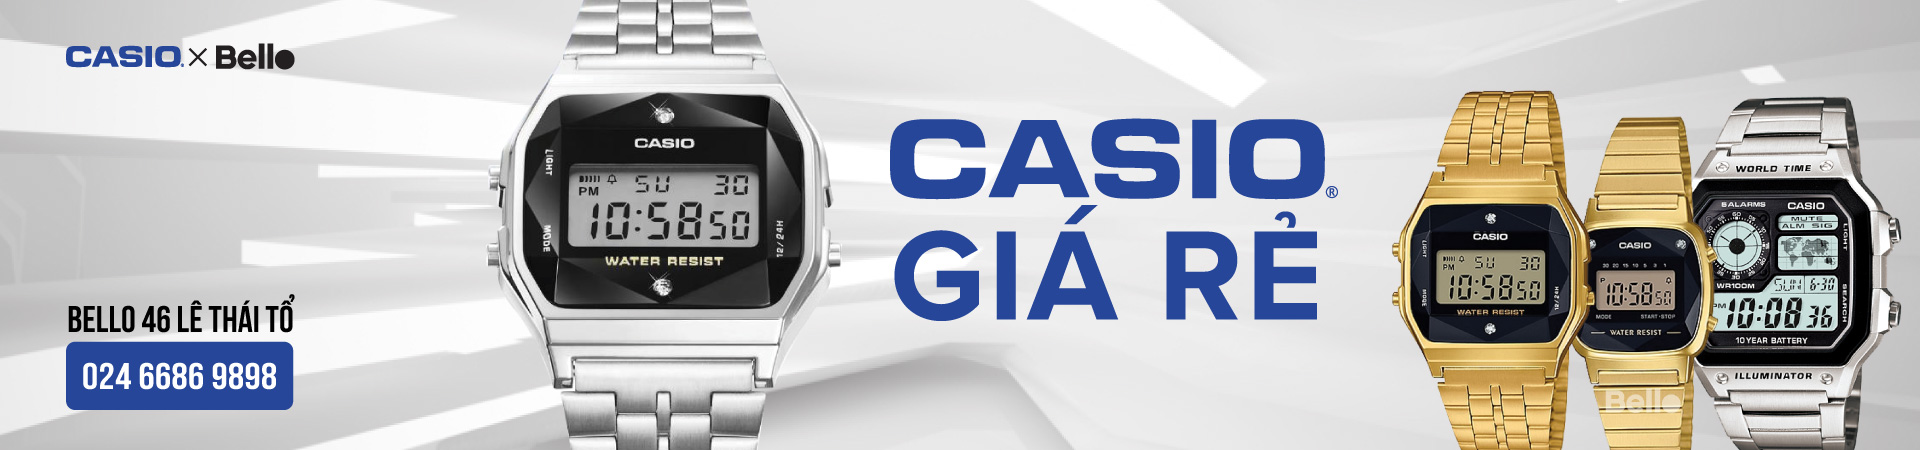 Casio Giá rẻ 2019